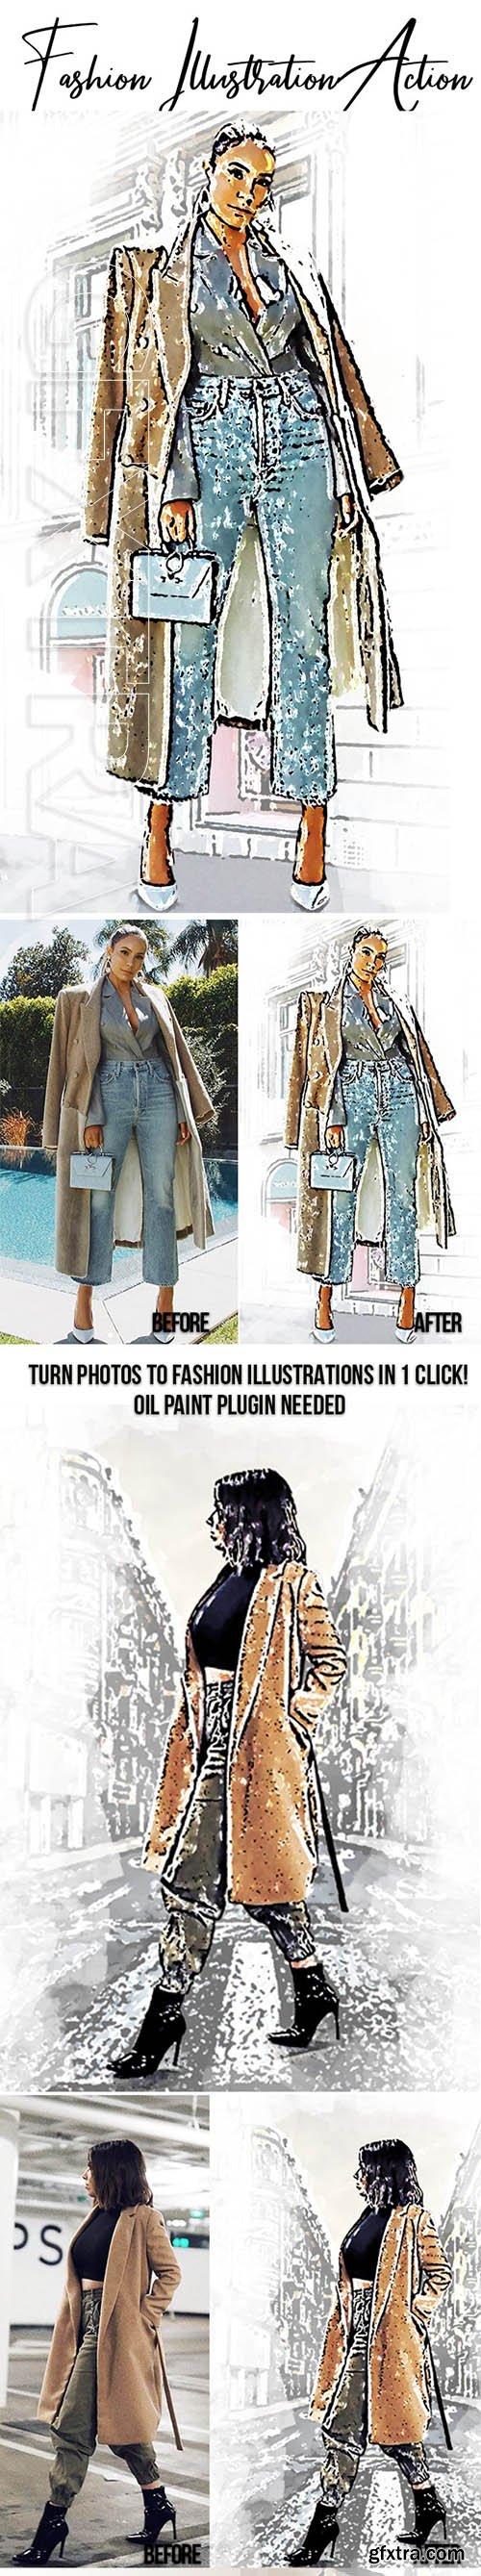 GraphicRiver - Fashion Illustration Effect 23766073